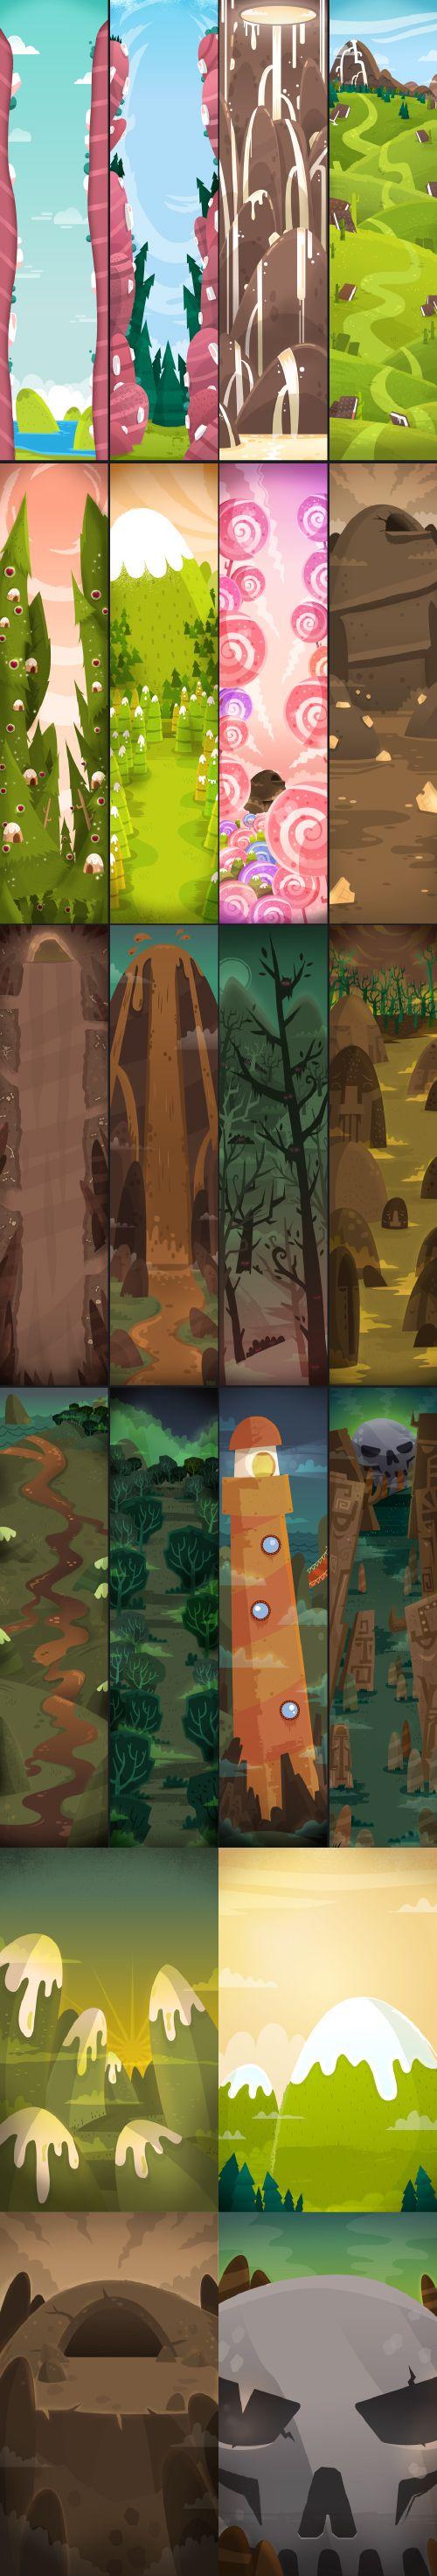 :::MonsterUp Adventures - Game Graphics::: on Behance